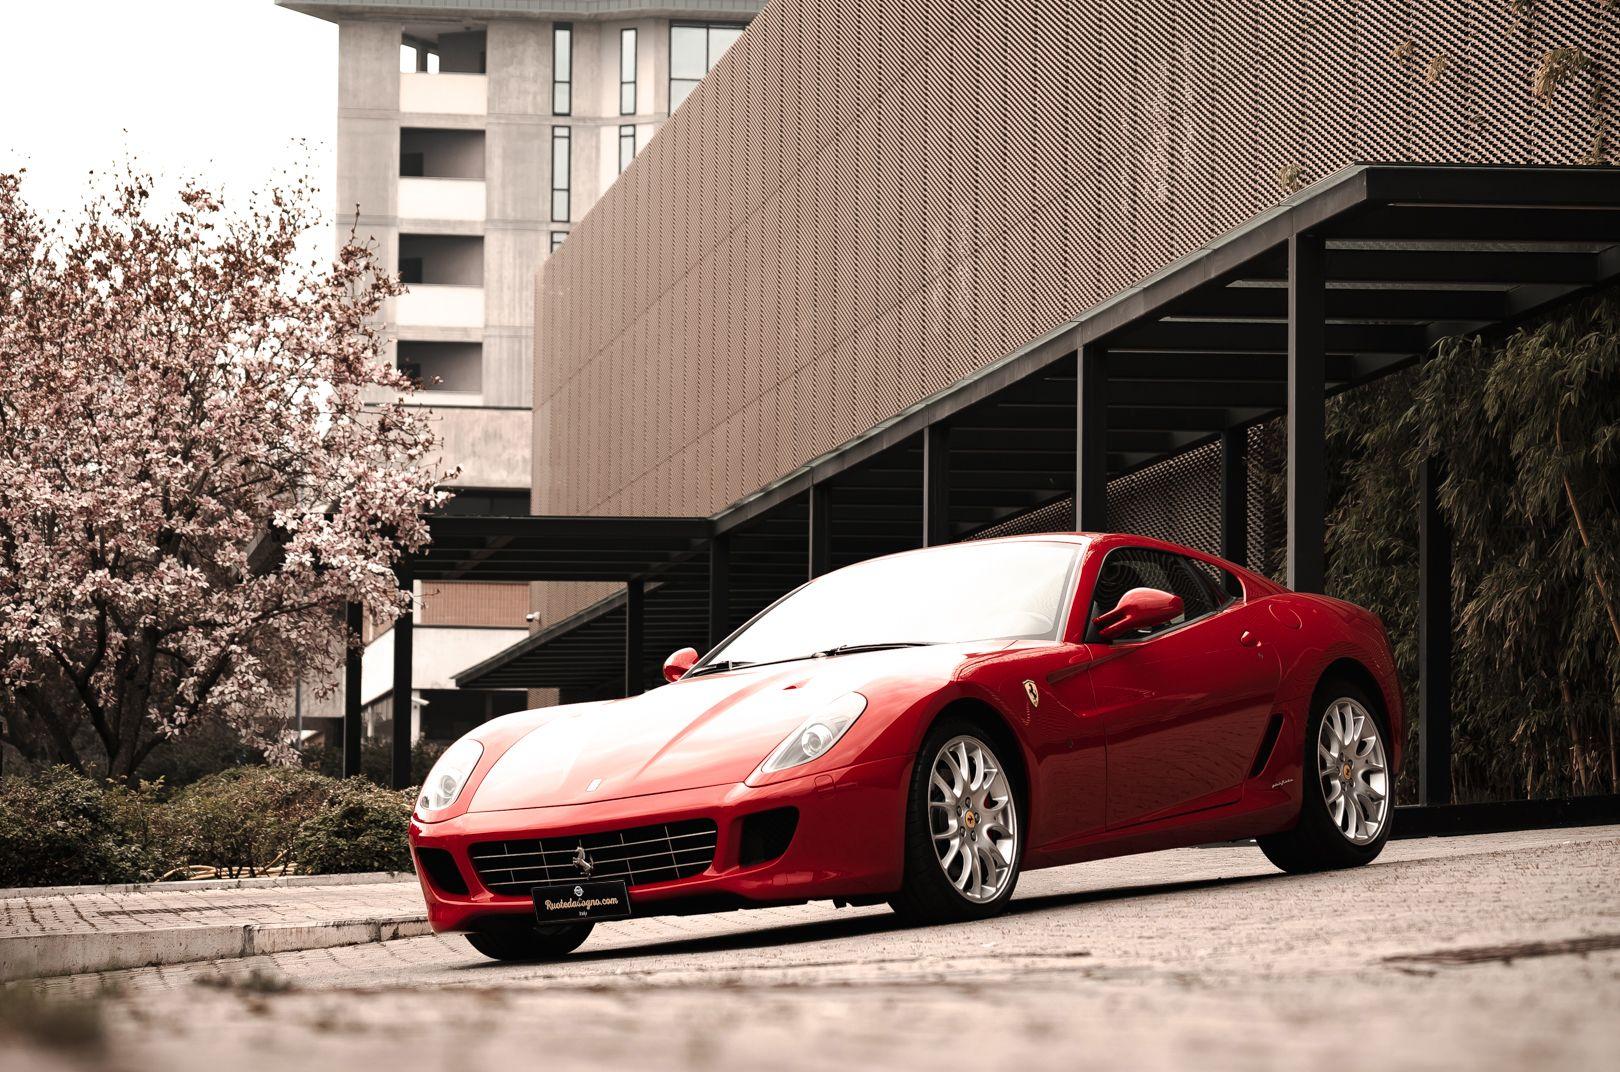 2007 Ferrari 599 GTB Fiorano 64974